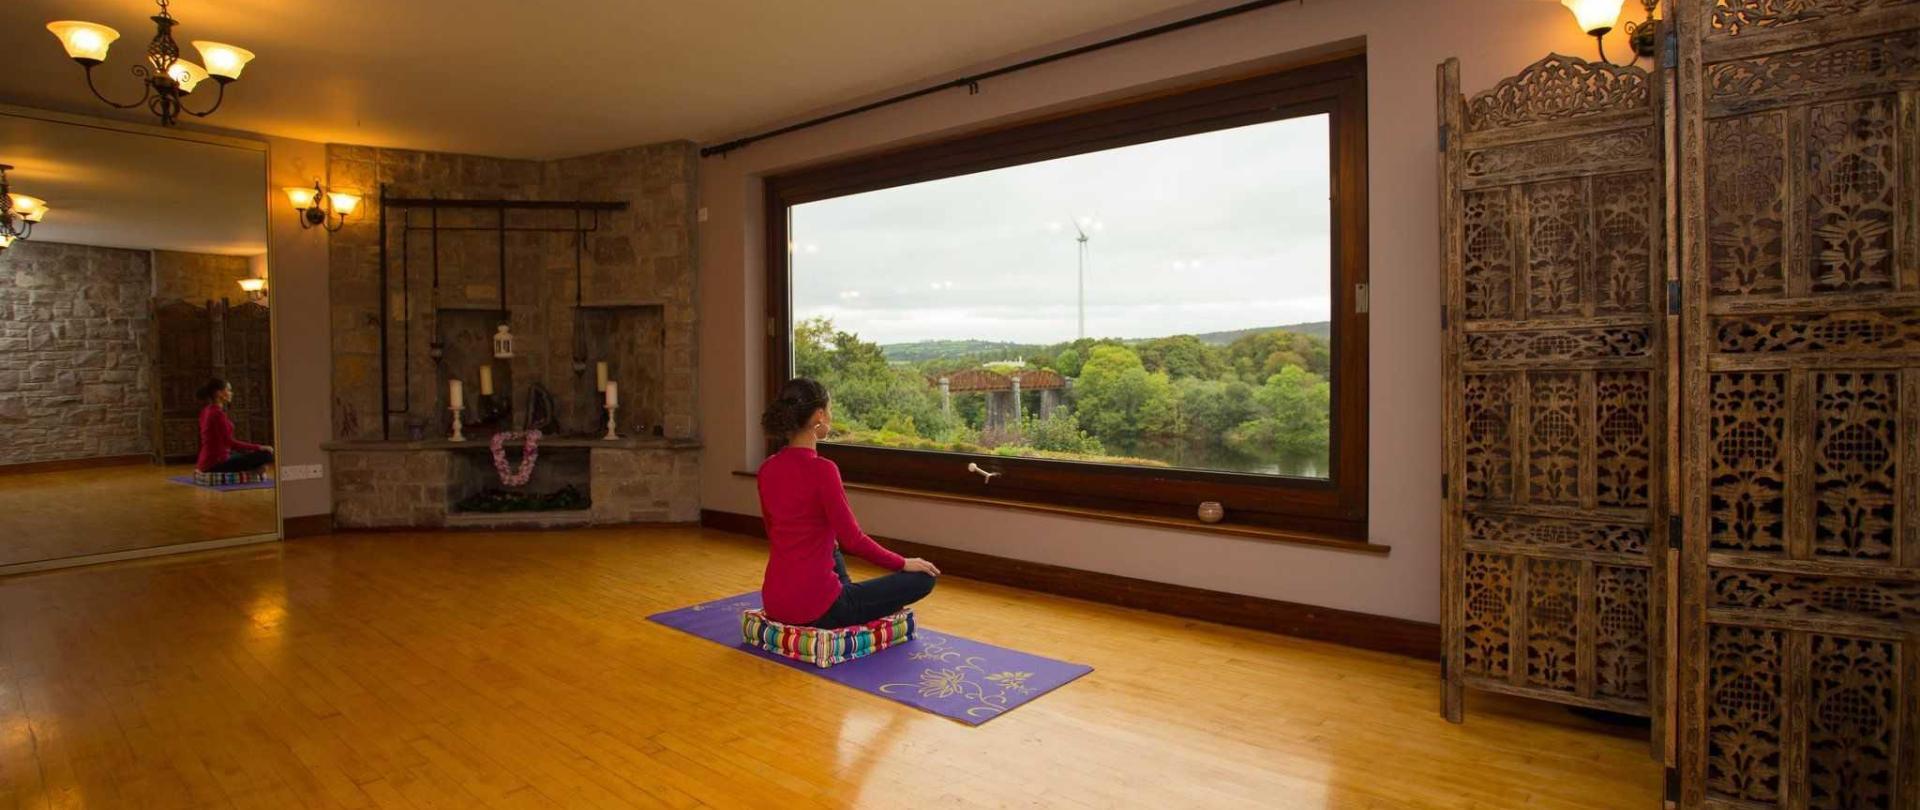 yoga-room-1.jpg